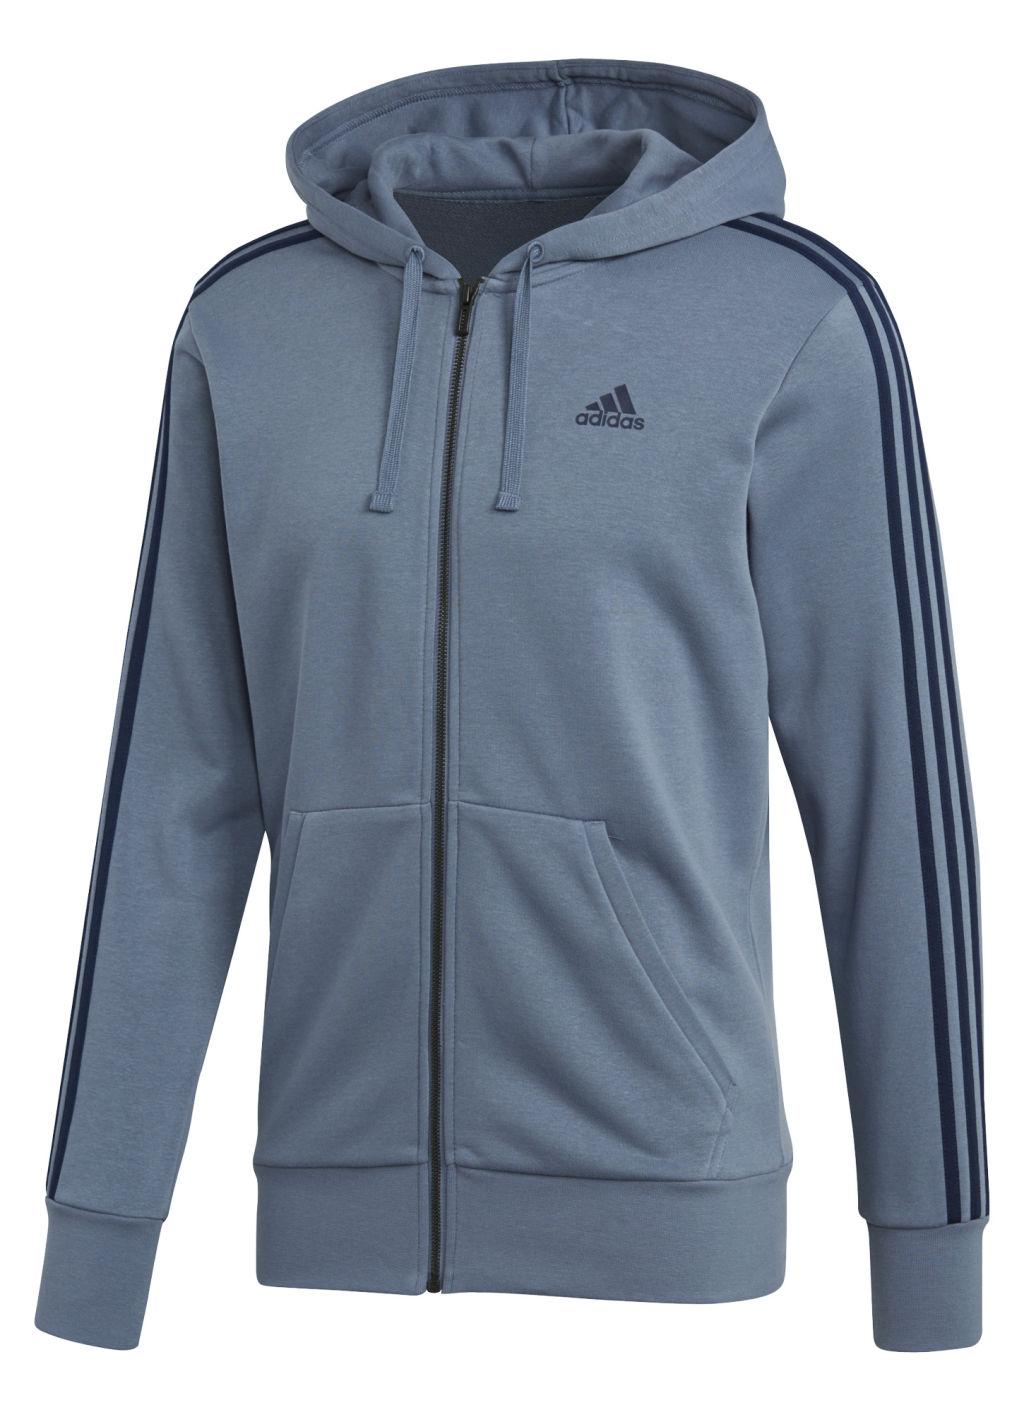 Adidas ESS 3S FZ FT miesten huppari Tummanharmaa caefd6c387